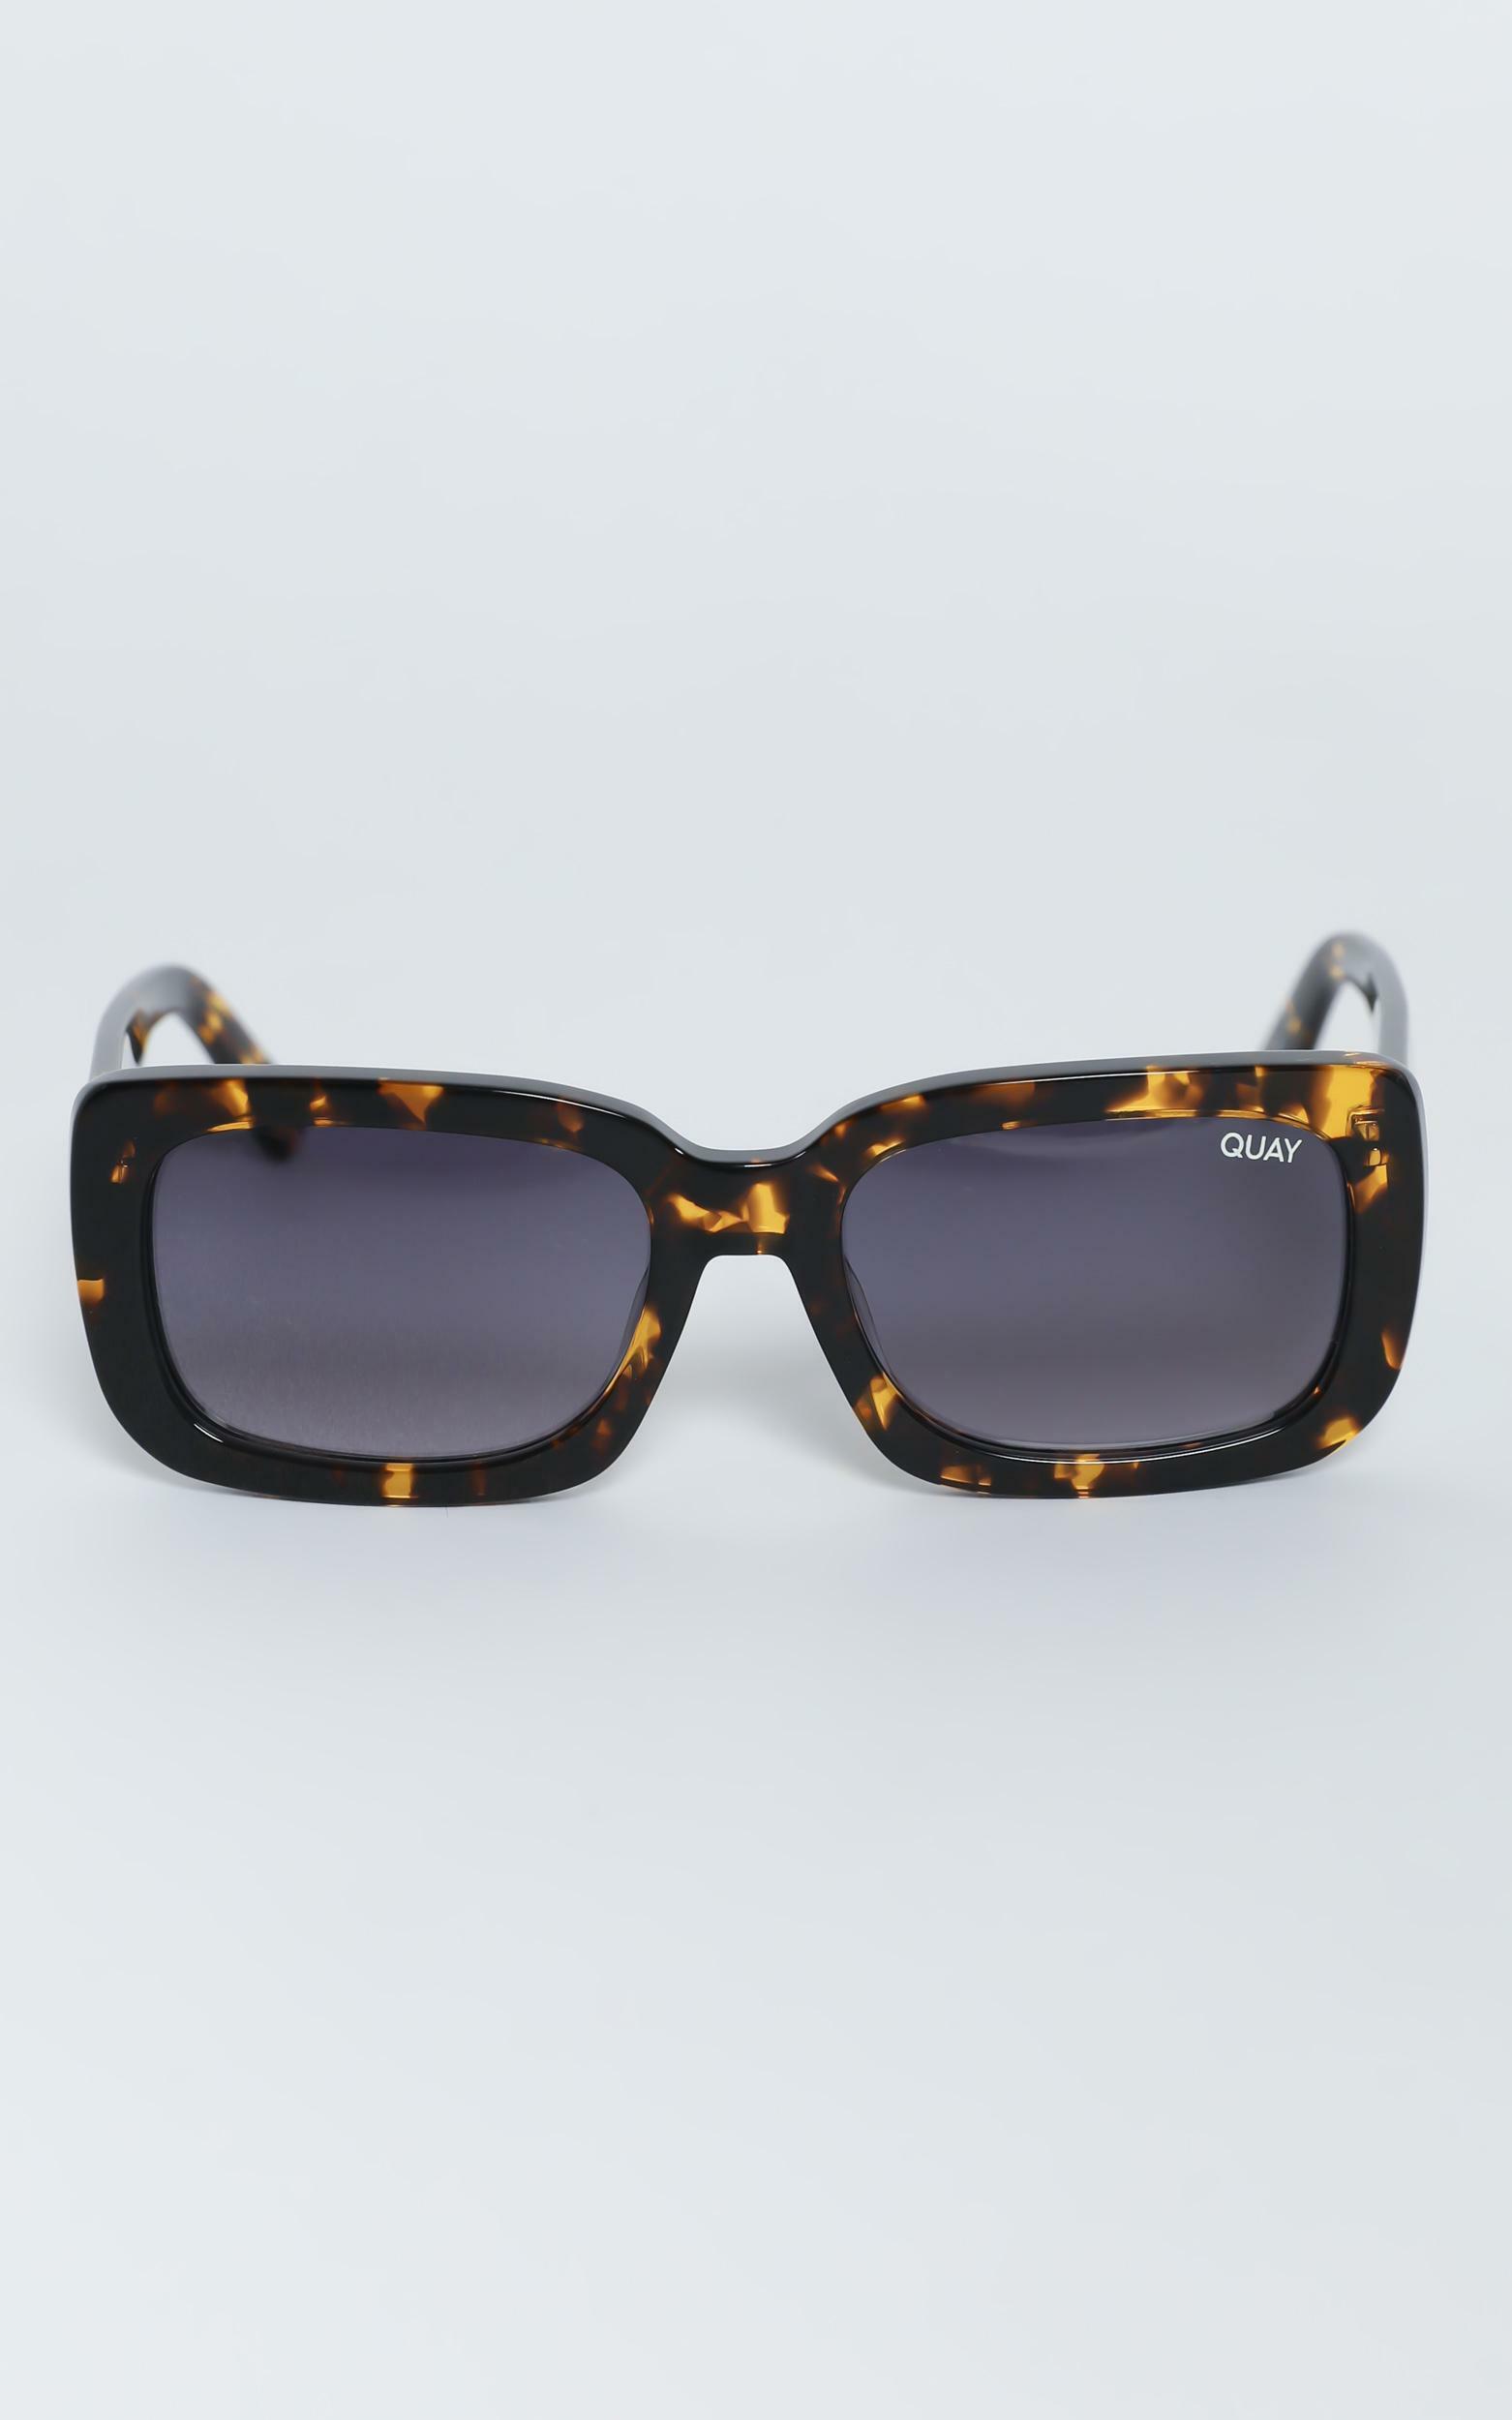 Quay - Yada Yada Sunglasses in Tort / Smoke, NEU4, hi-res image number null